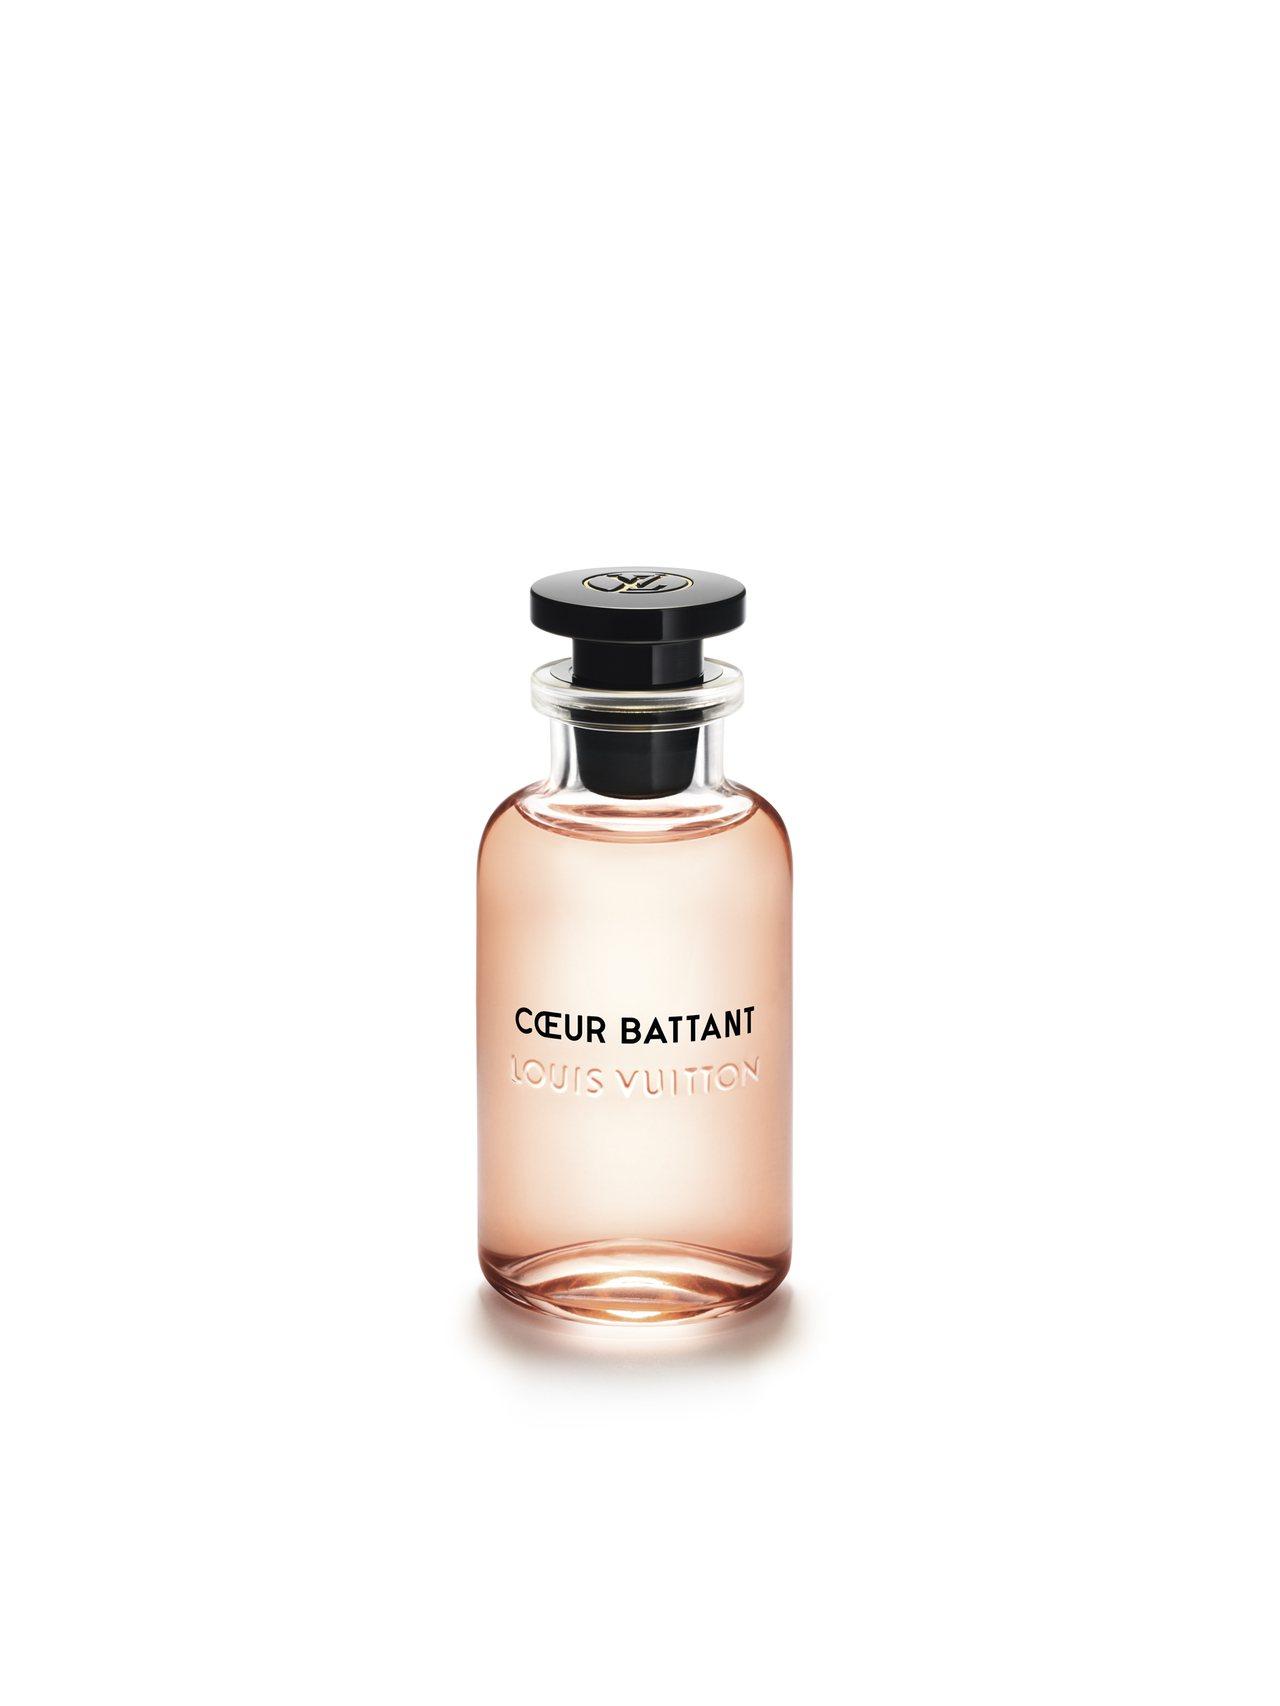 Coeur Battant香水,100ml售價8,600元、200 ml售價12...